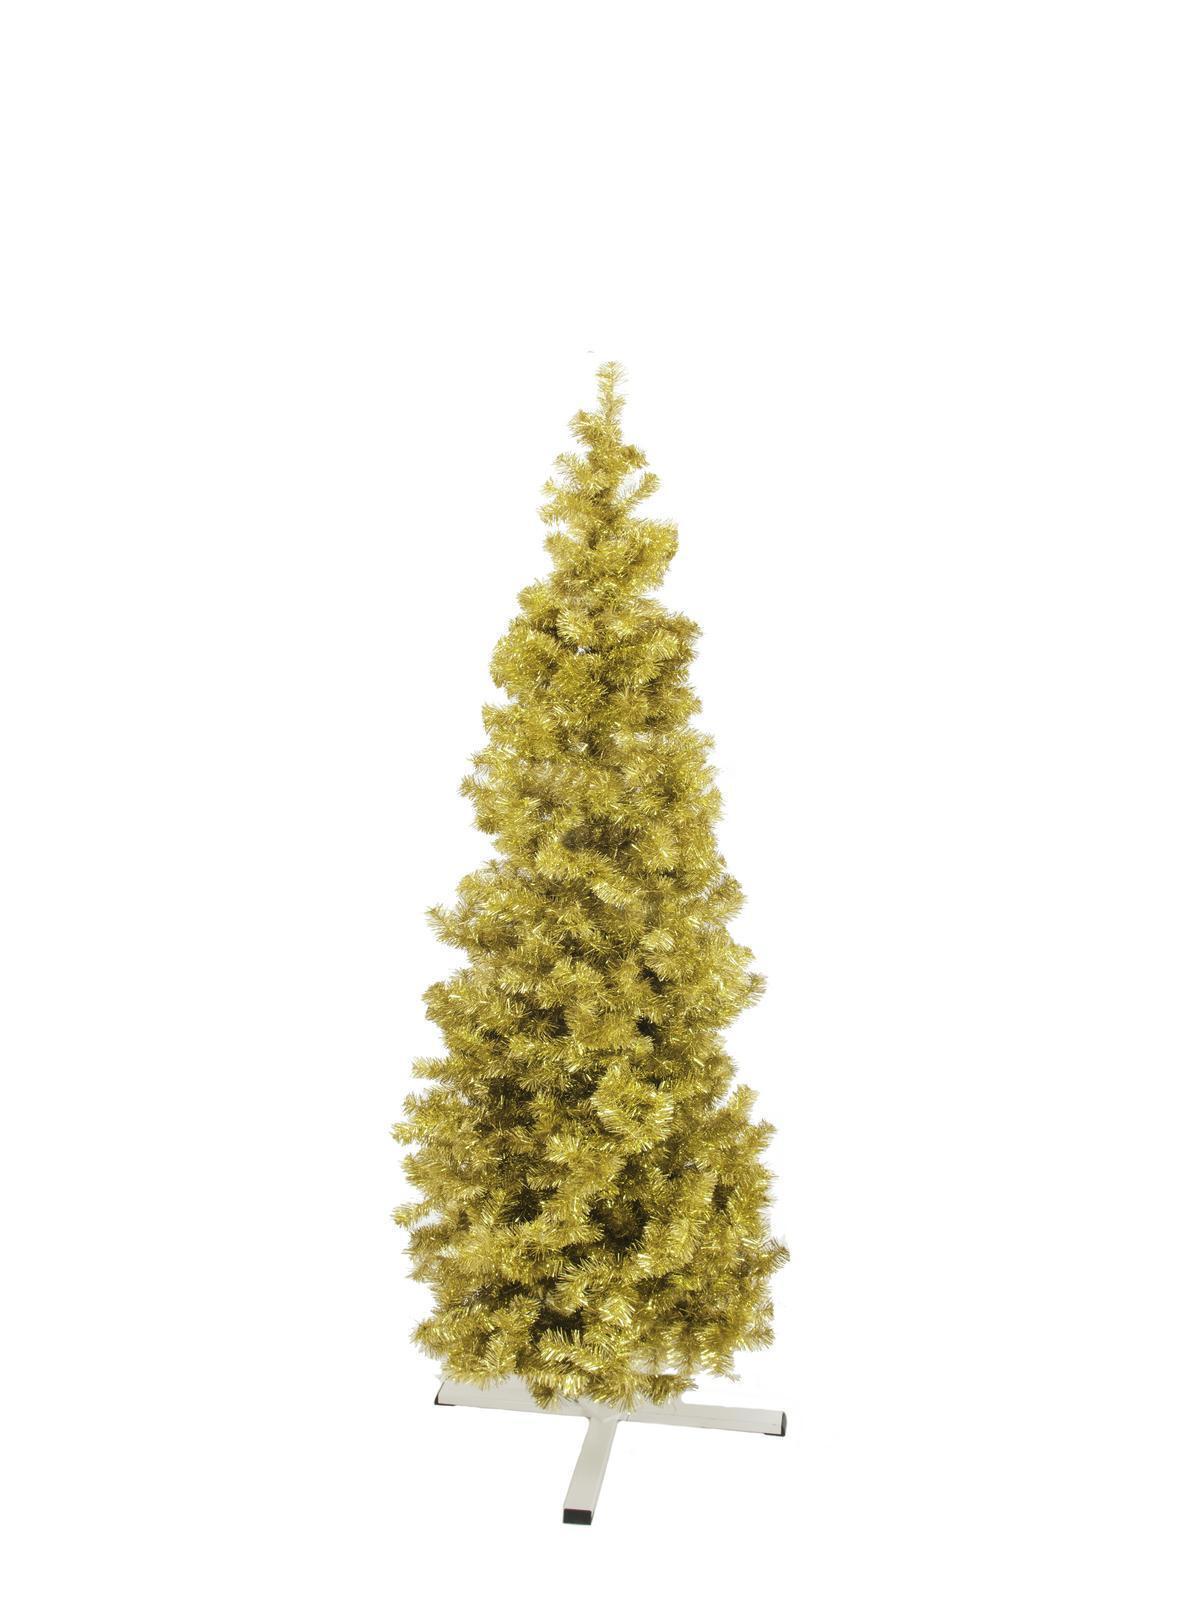 Europalms tannenbaum árbol de Navidad futura, oro-metalizado, 180cm